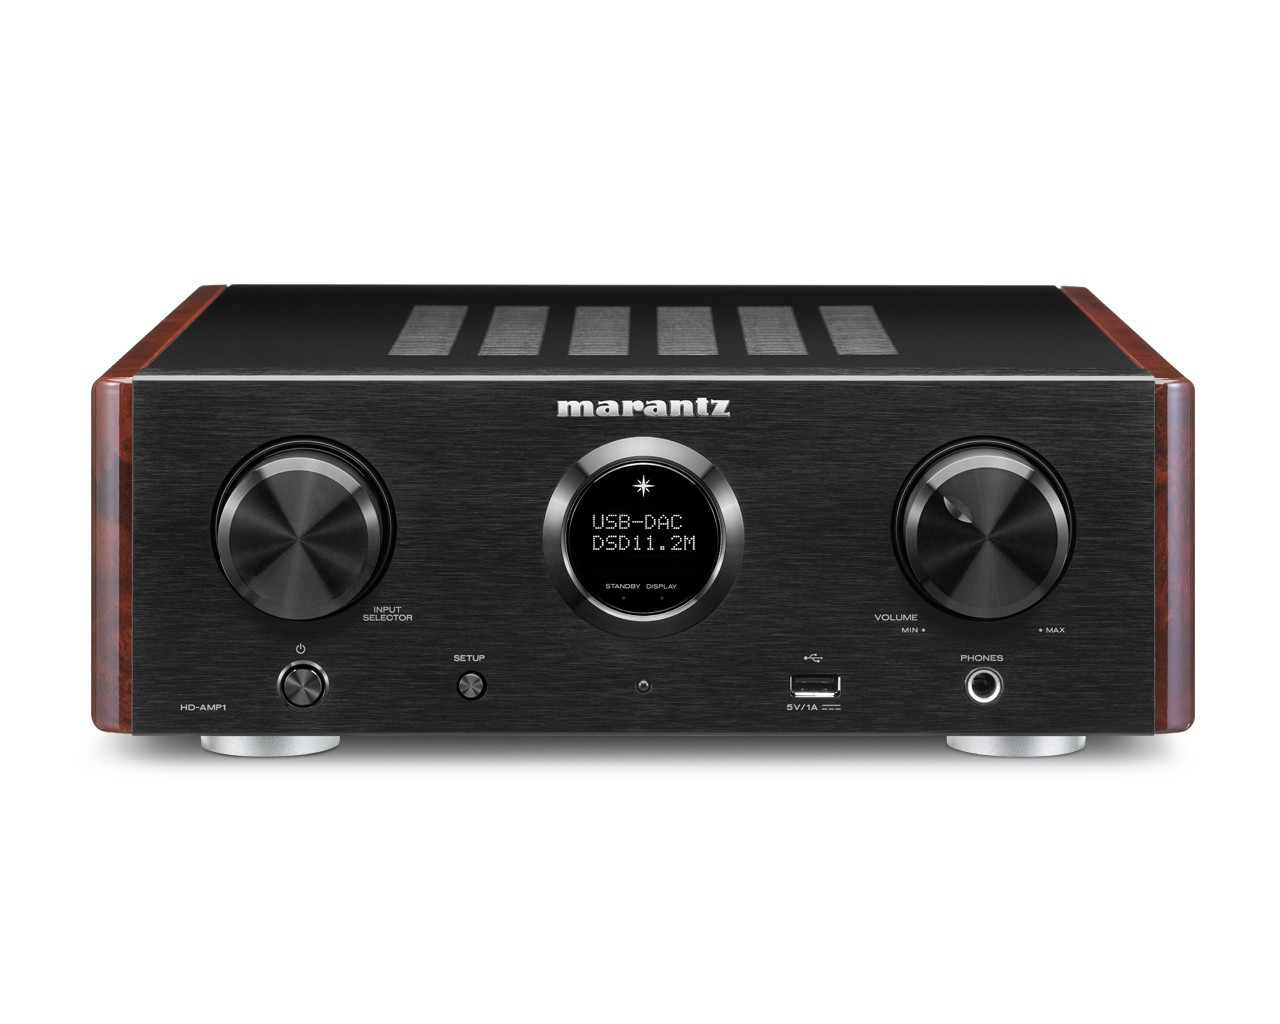 Стерео усилитель с ЦАП: Marantz HD-AMP 1 Black -